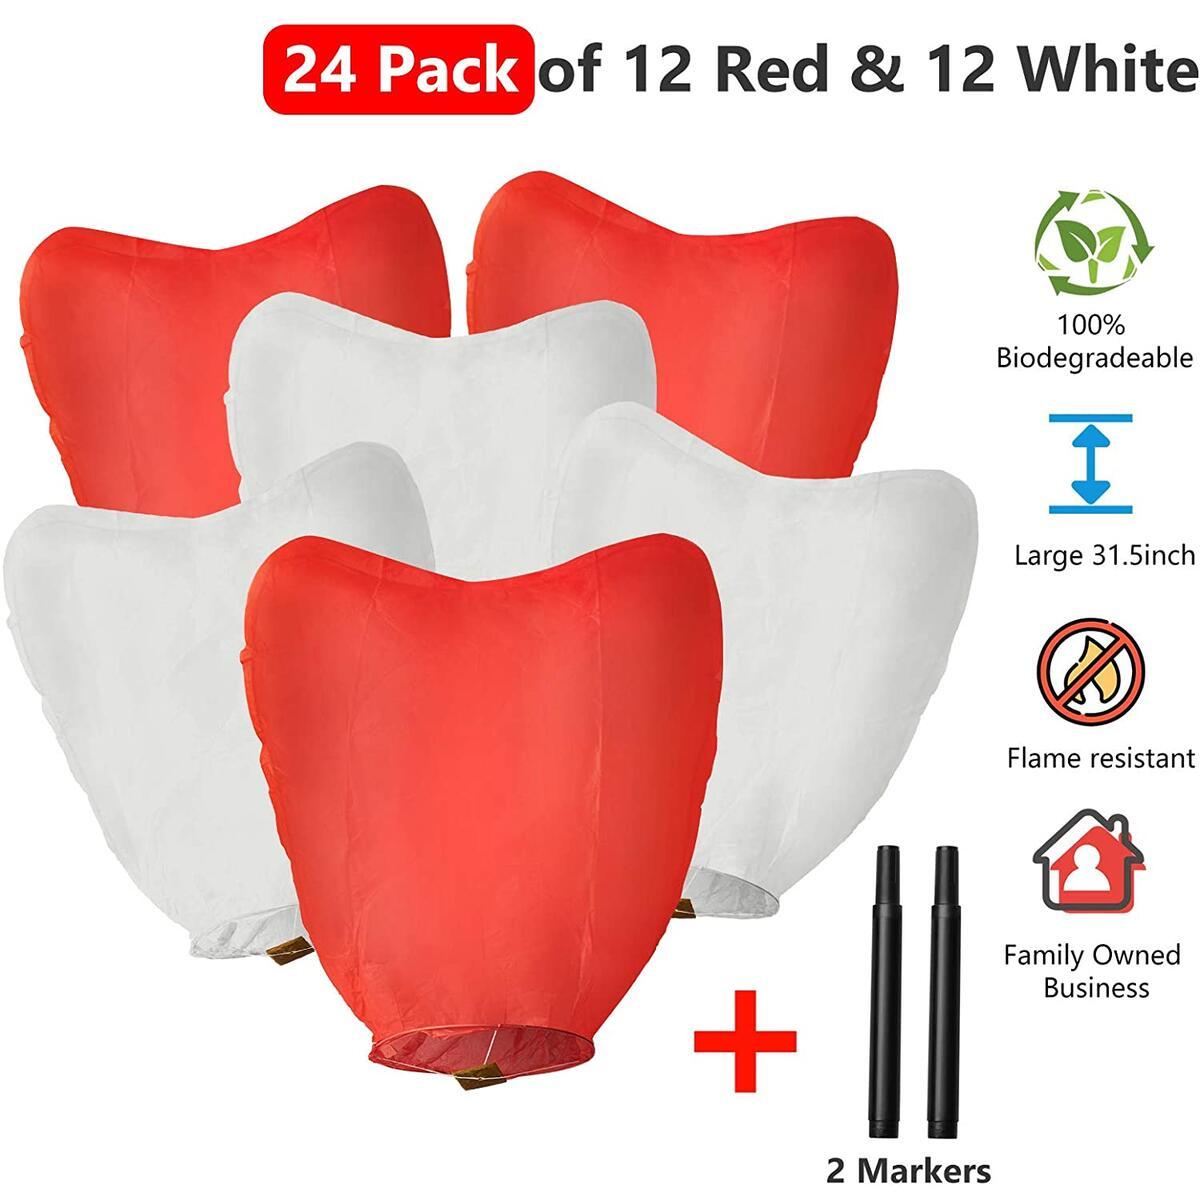 Chinese sky lanterns - 24 Pack Biodegradable Wishing Lanterns - 12 White & 12 Red Hearts